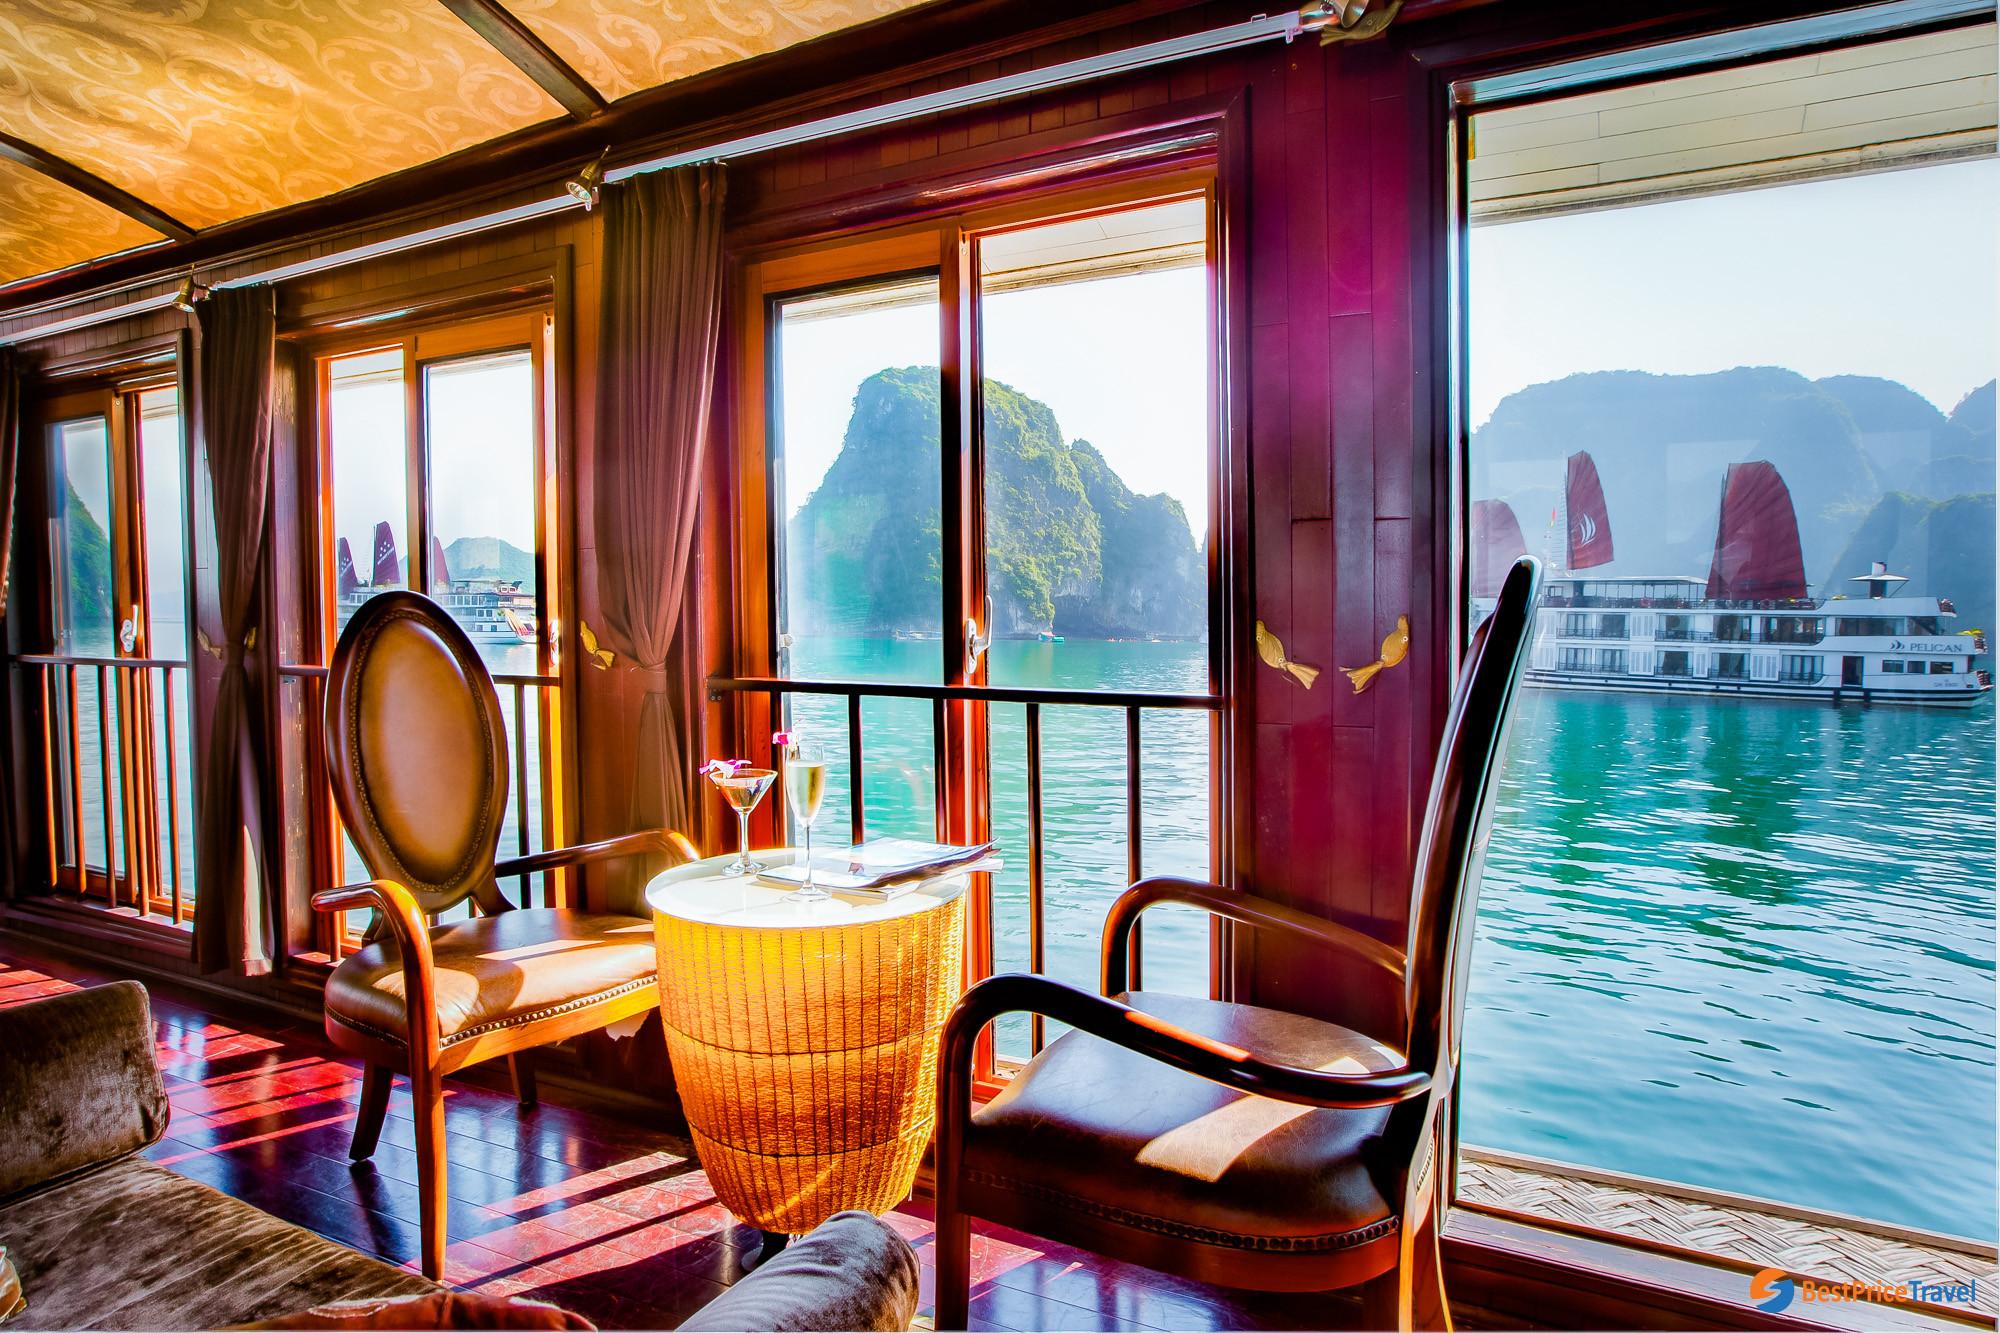 Restaurant on Pelican Cruise